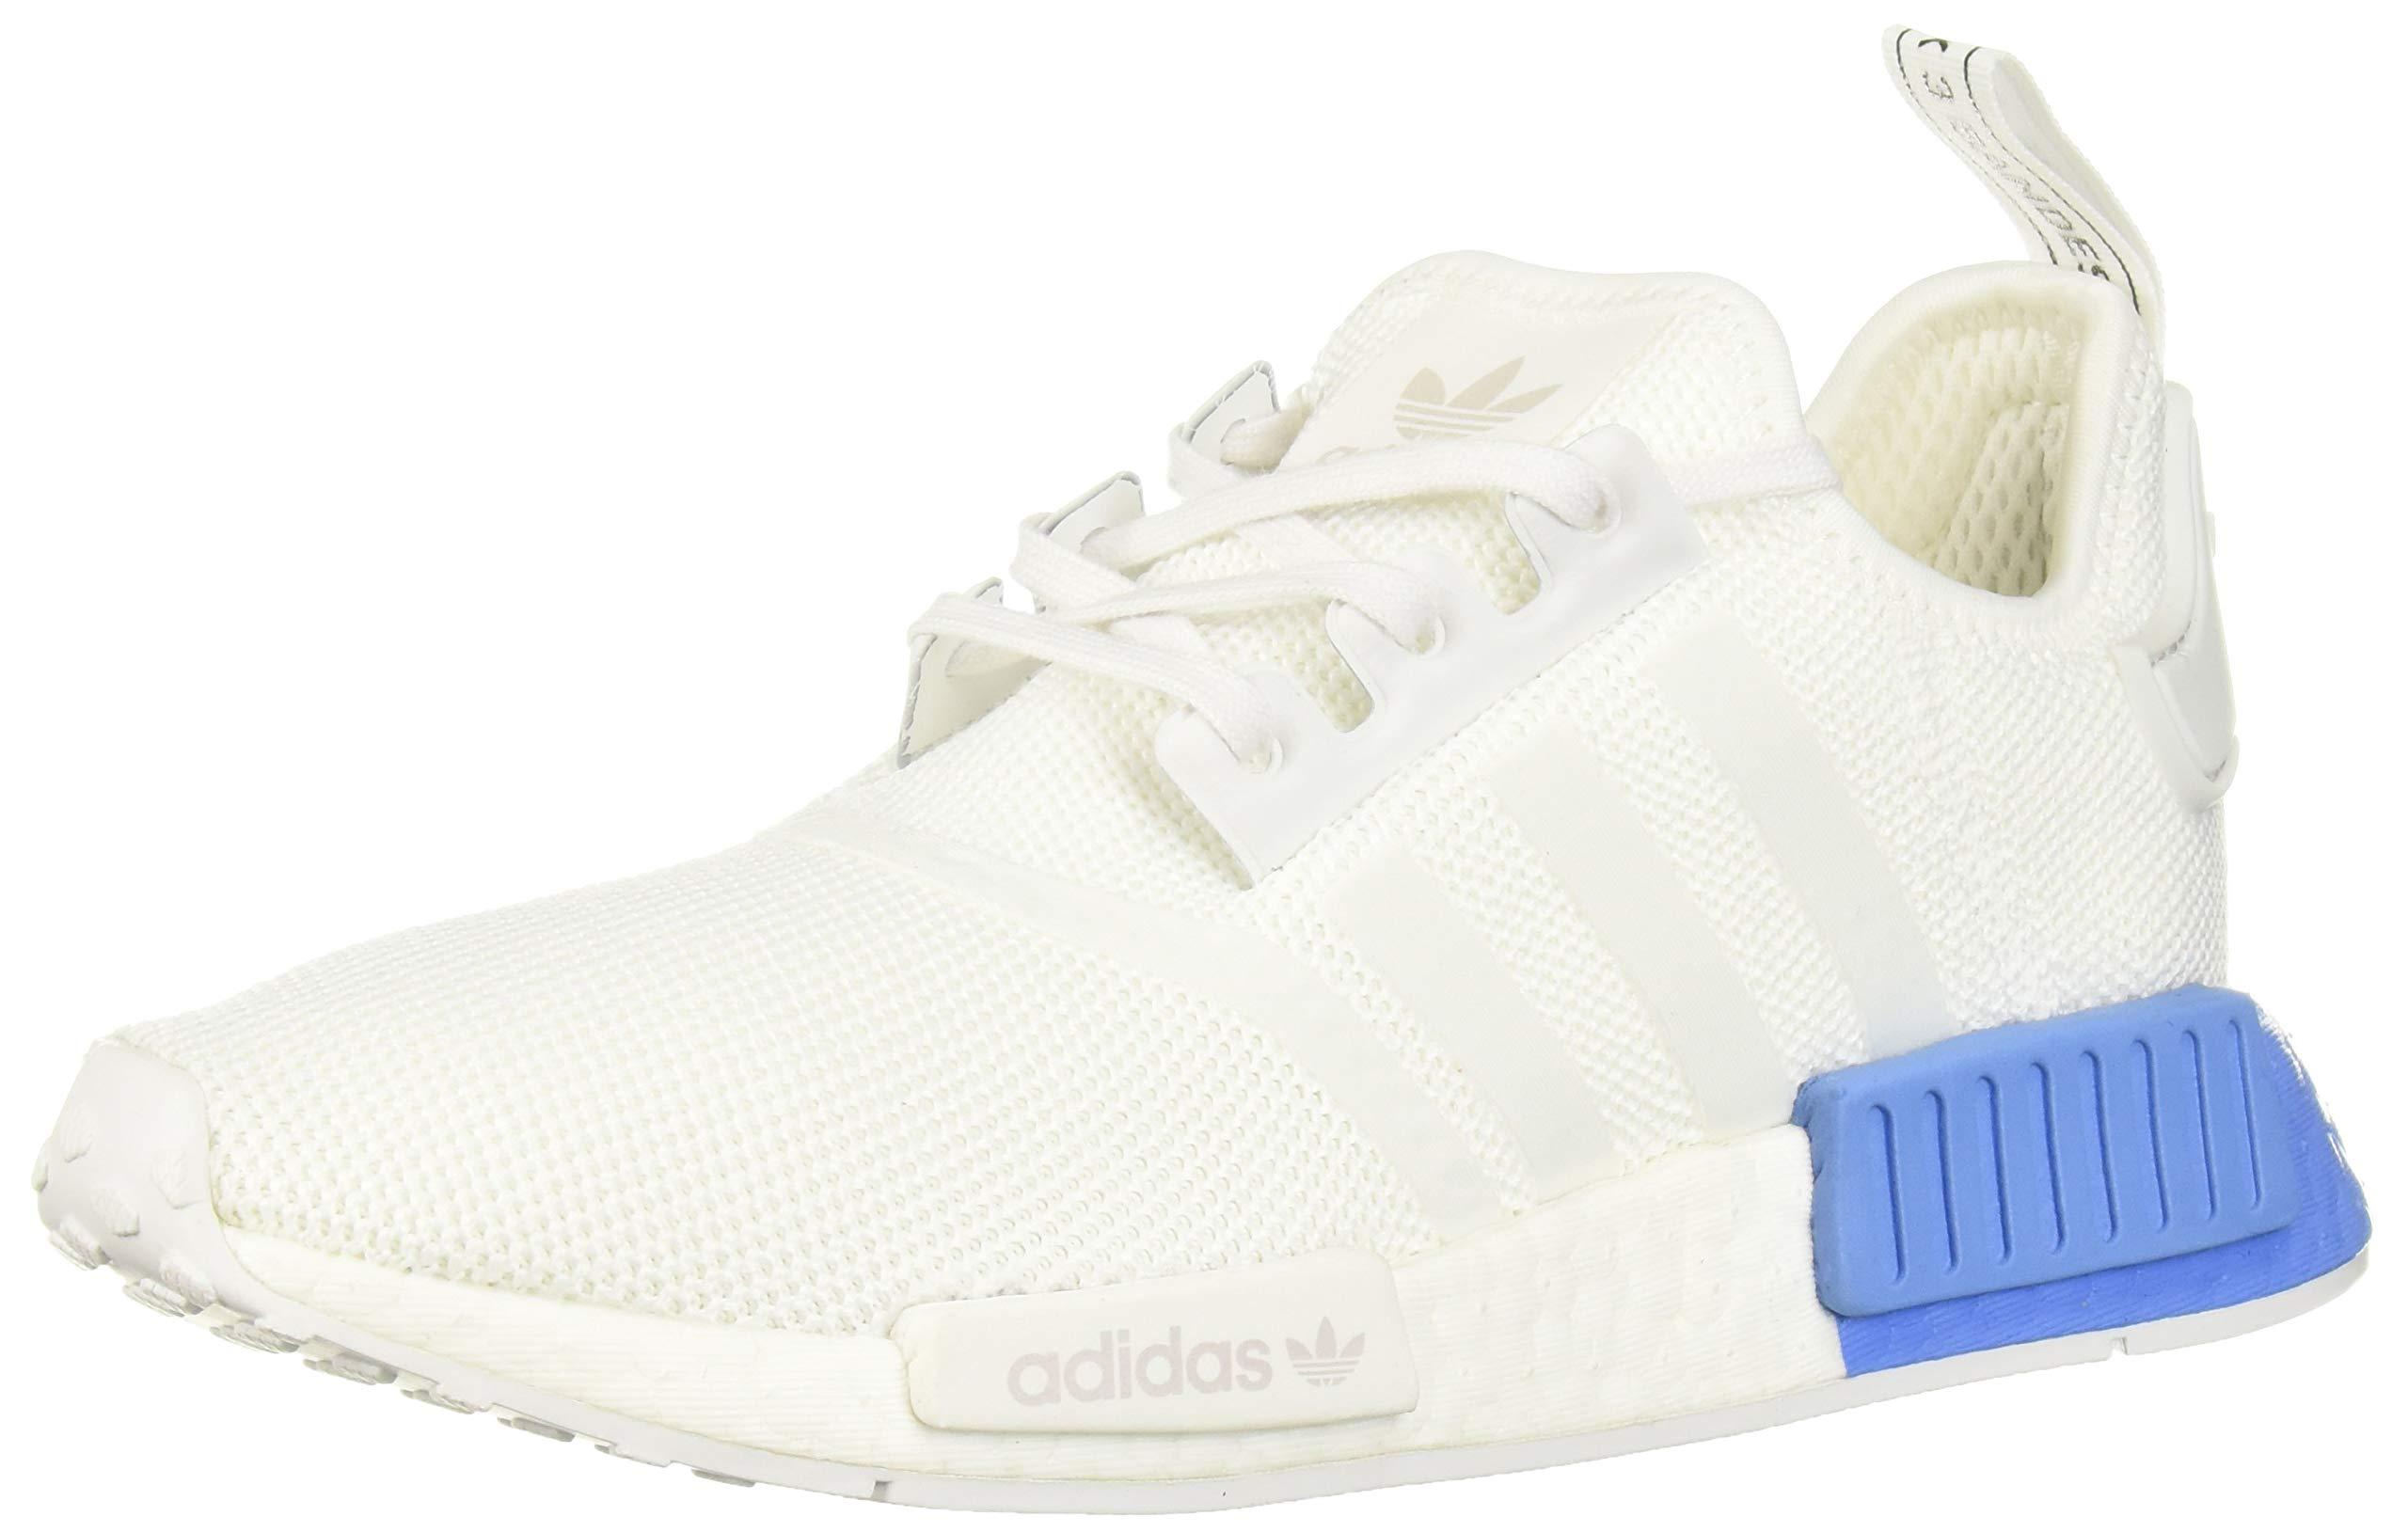 adidas Originals Unisex NMD_R1 Running Shoe, White/Real Blue, 4.5 M US Big Kid by adidas Originals